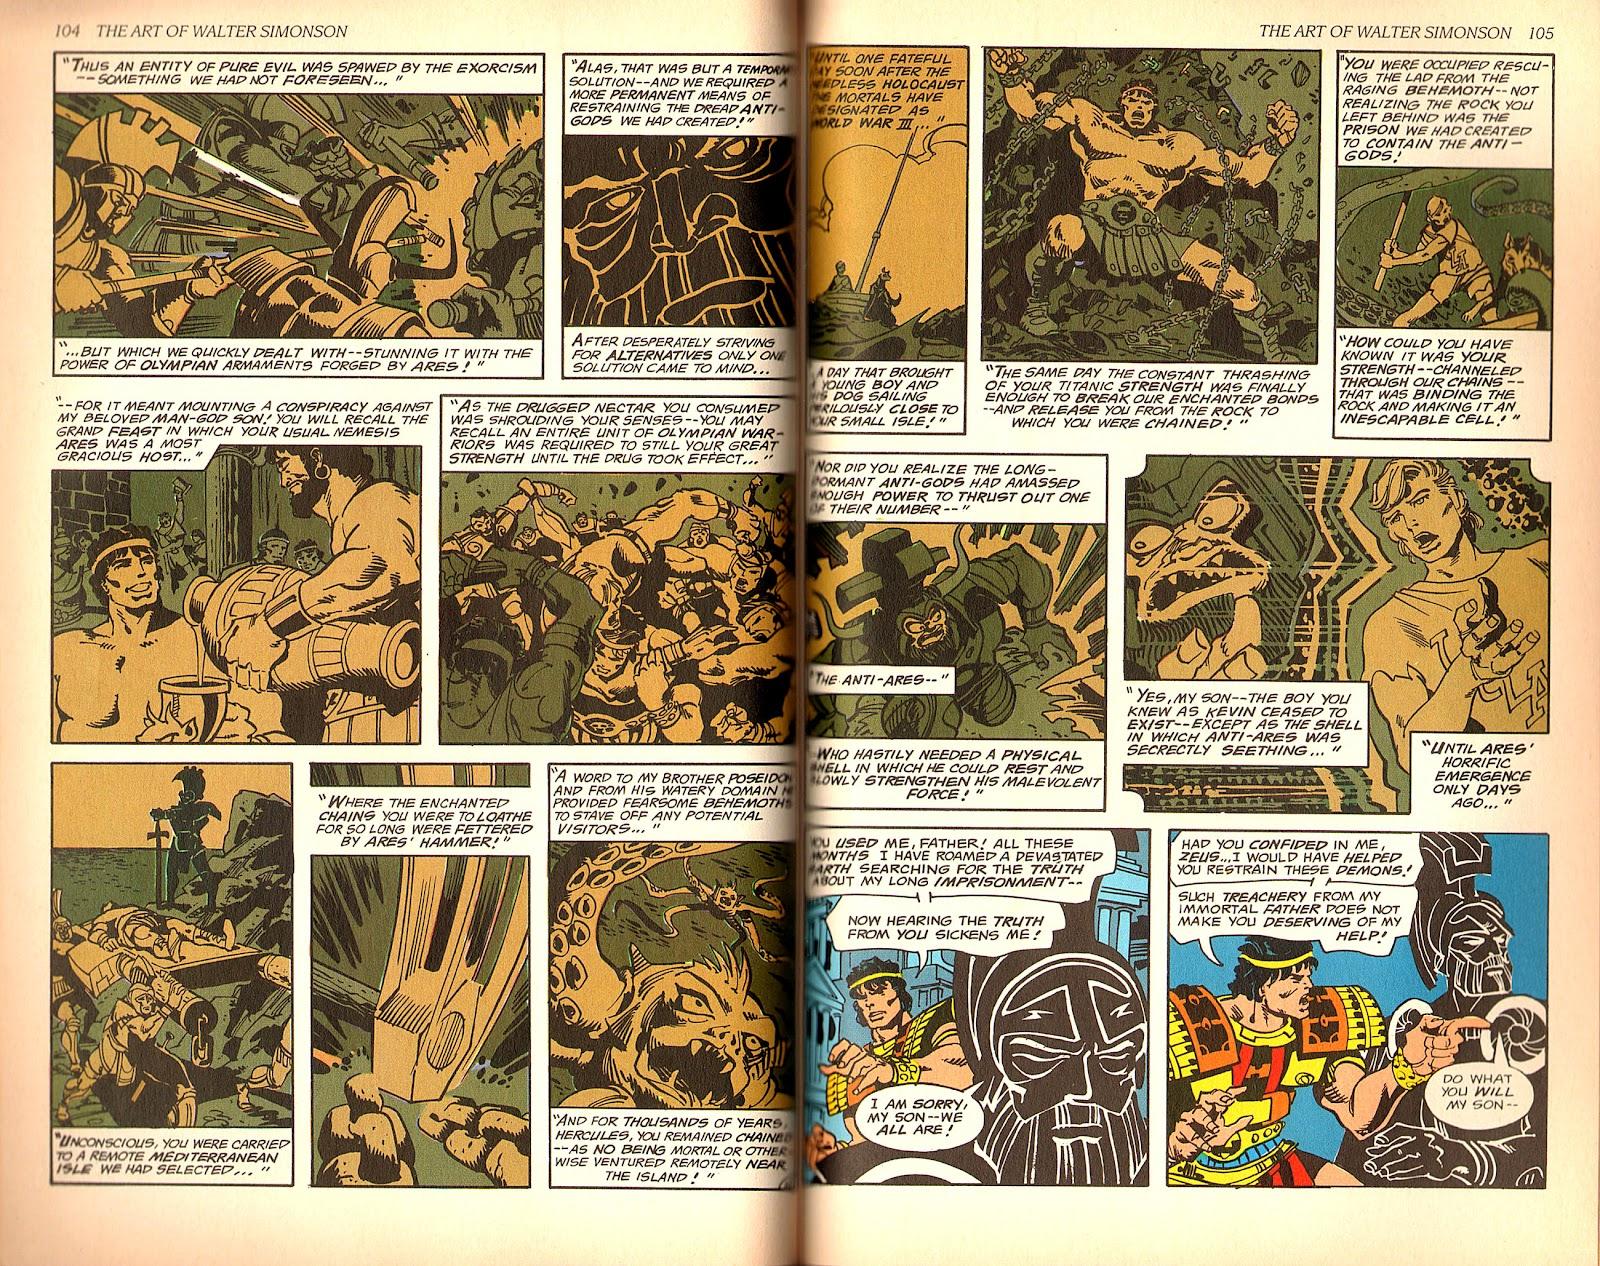 Read online The Art of Walter Simonson comic -  Issue # TPB - 54